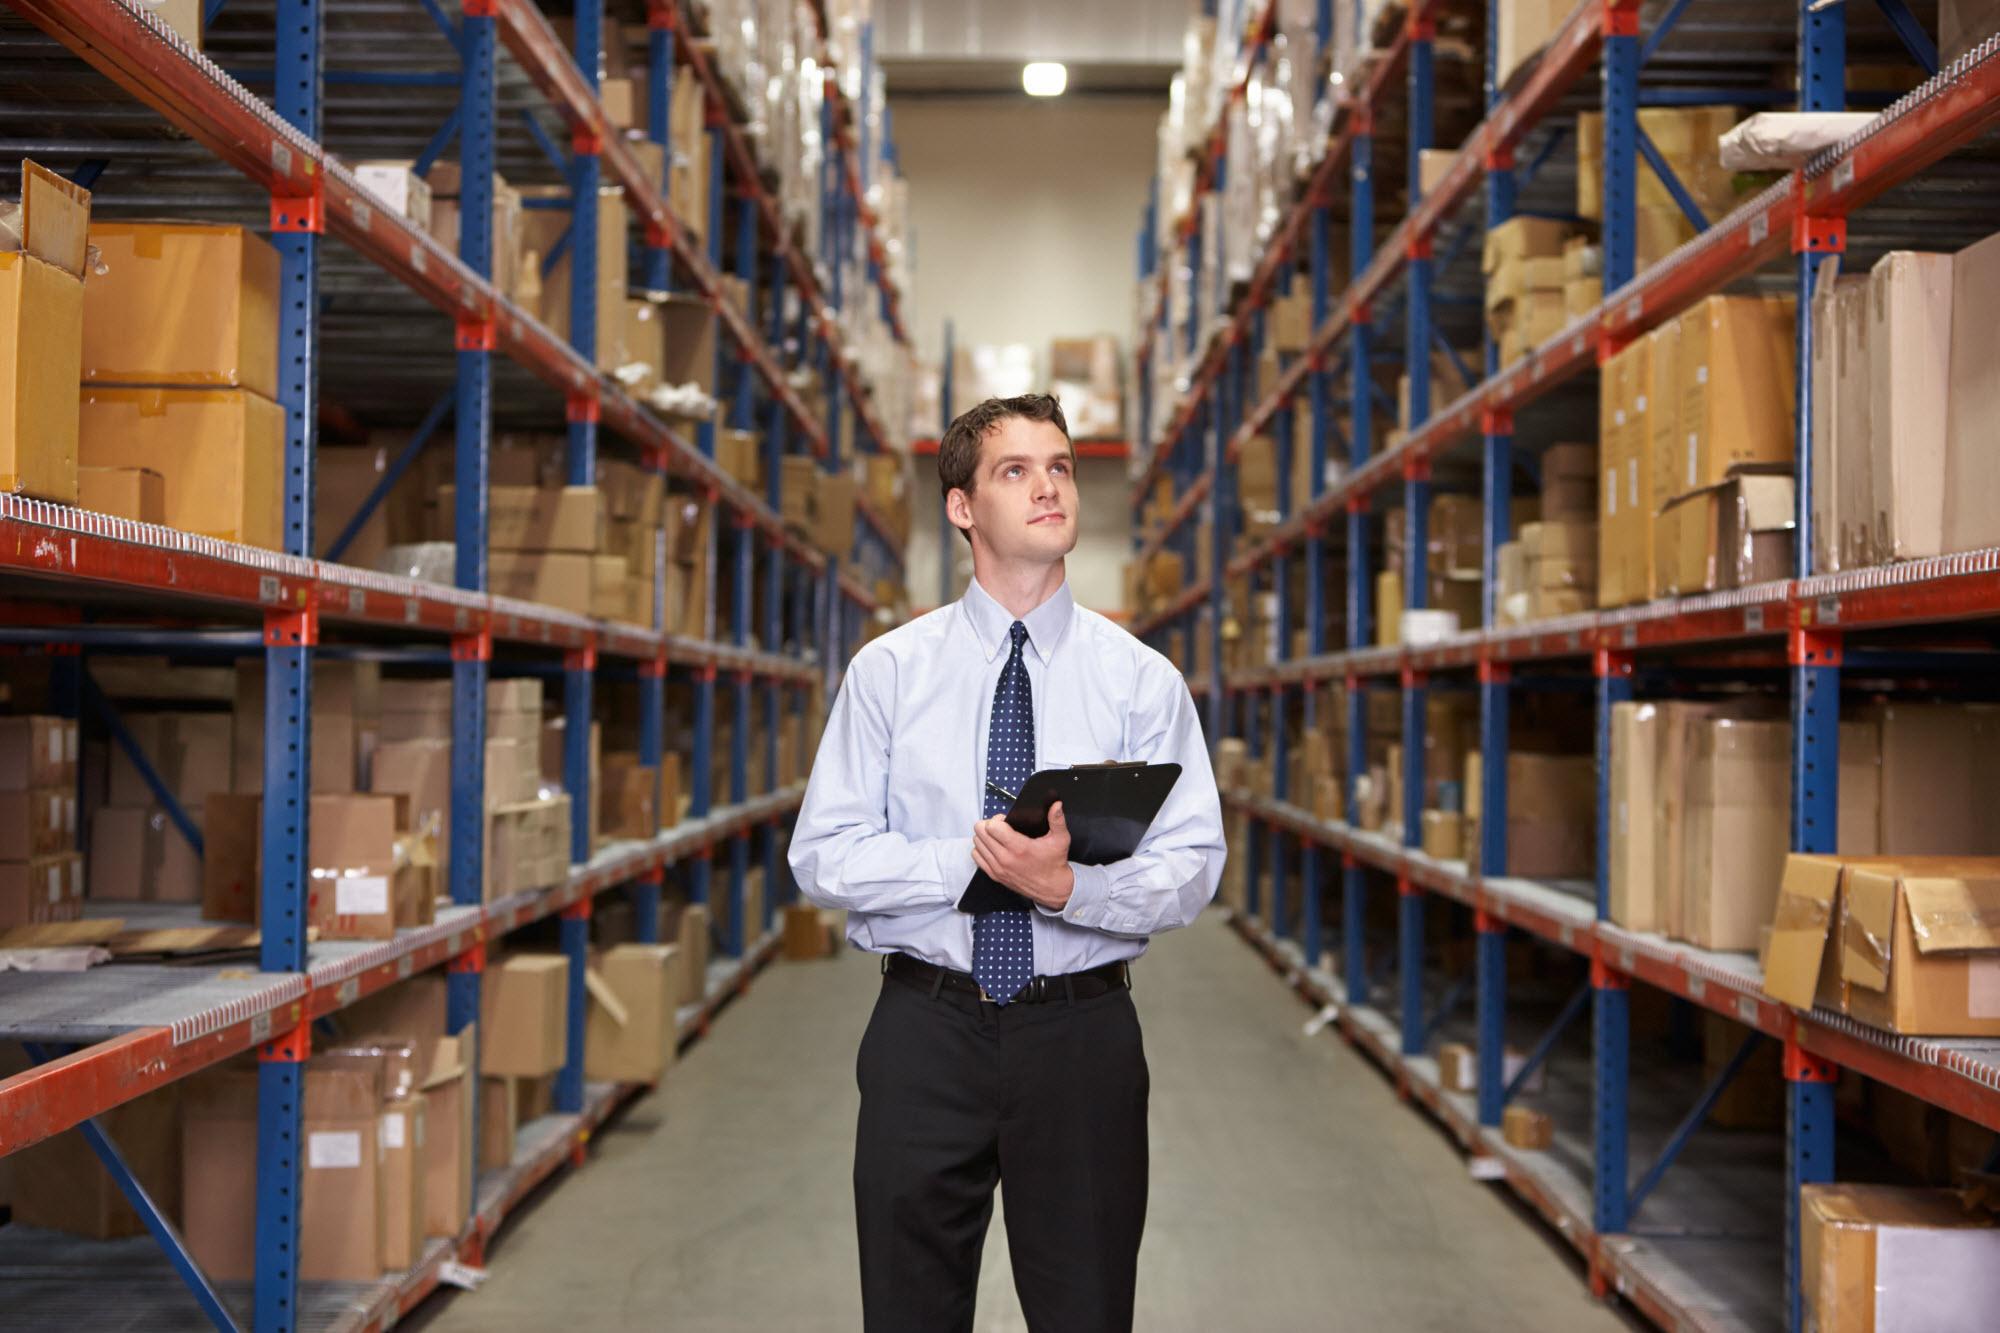 warehouse-management-system-wms_0-1